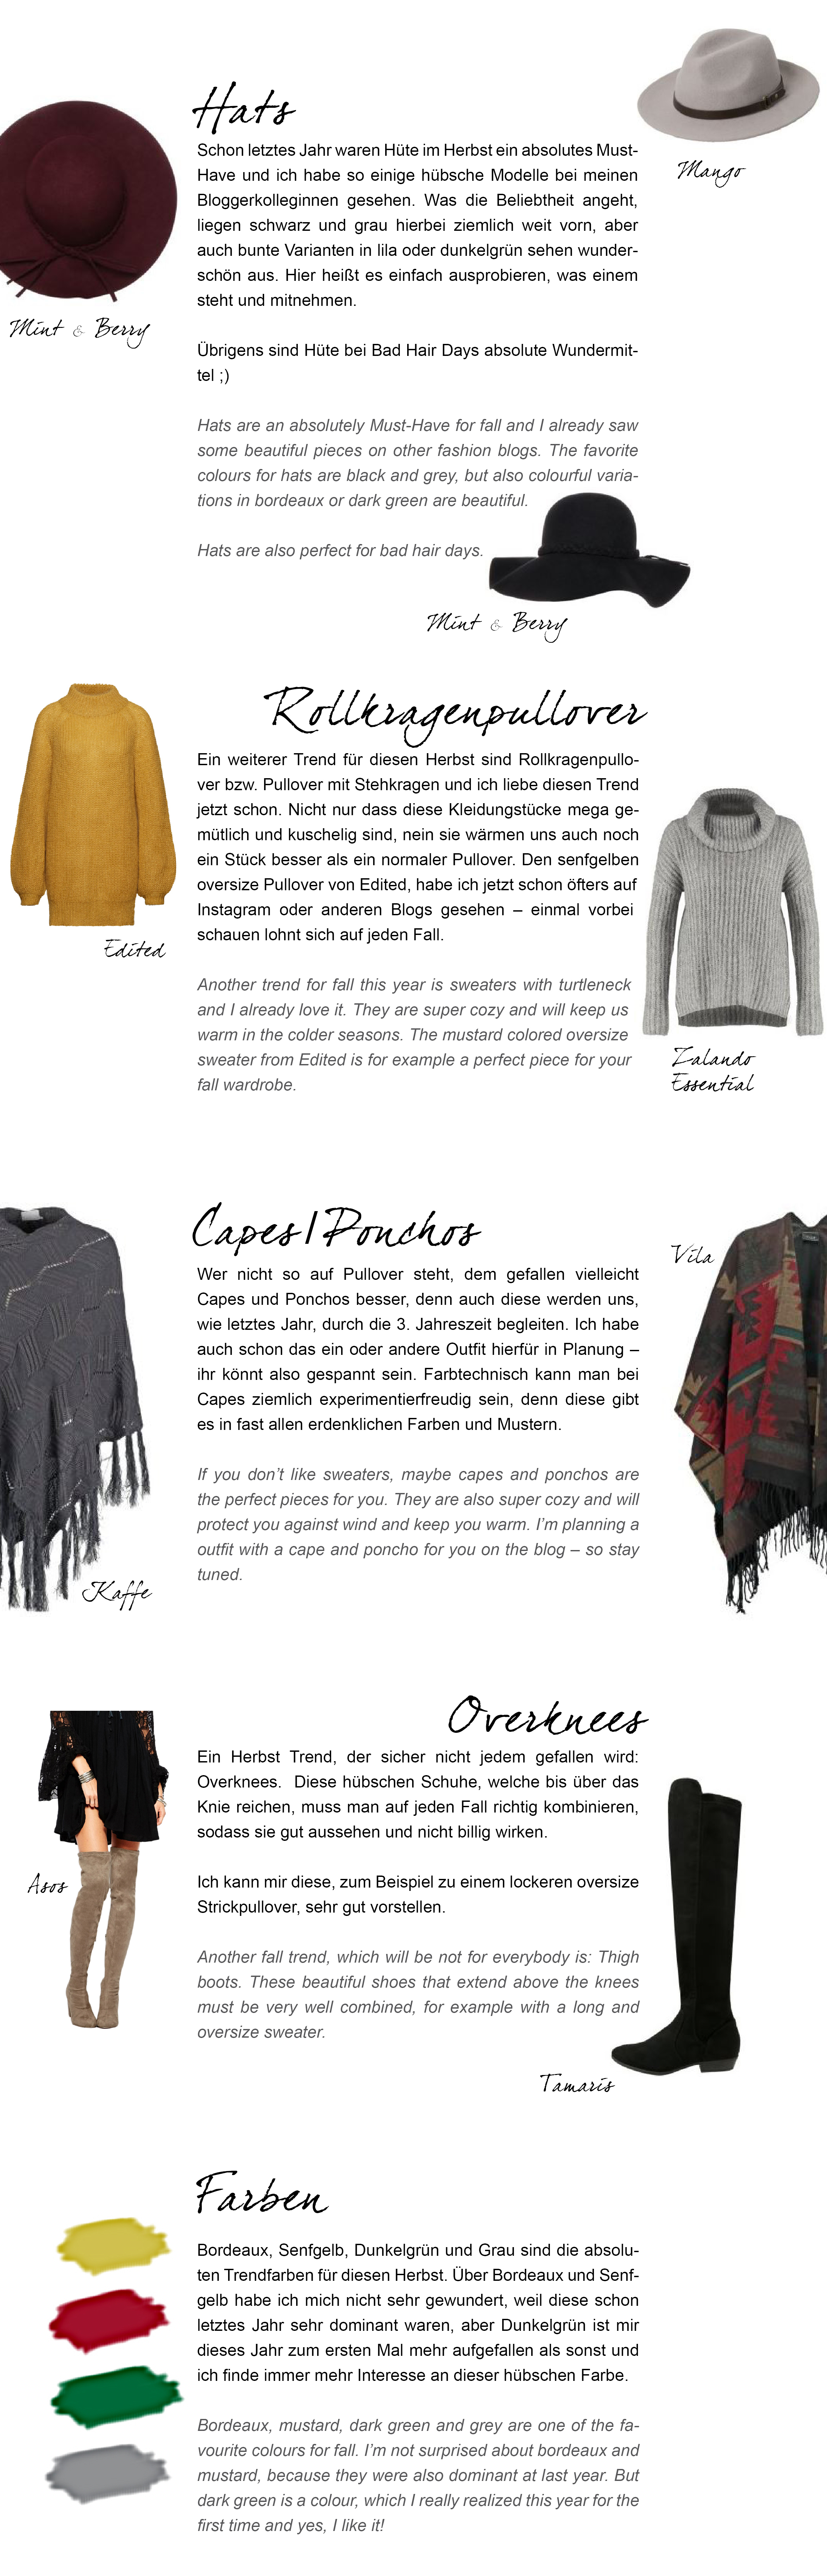 fashion herbst trends 2015 justmyself. Black Bedroom Furniture Sets. Home Design Ideas